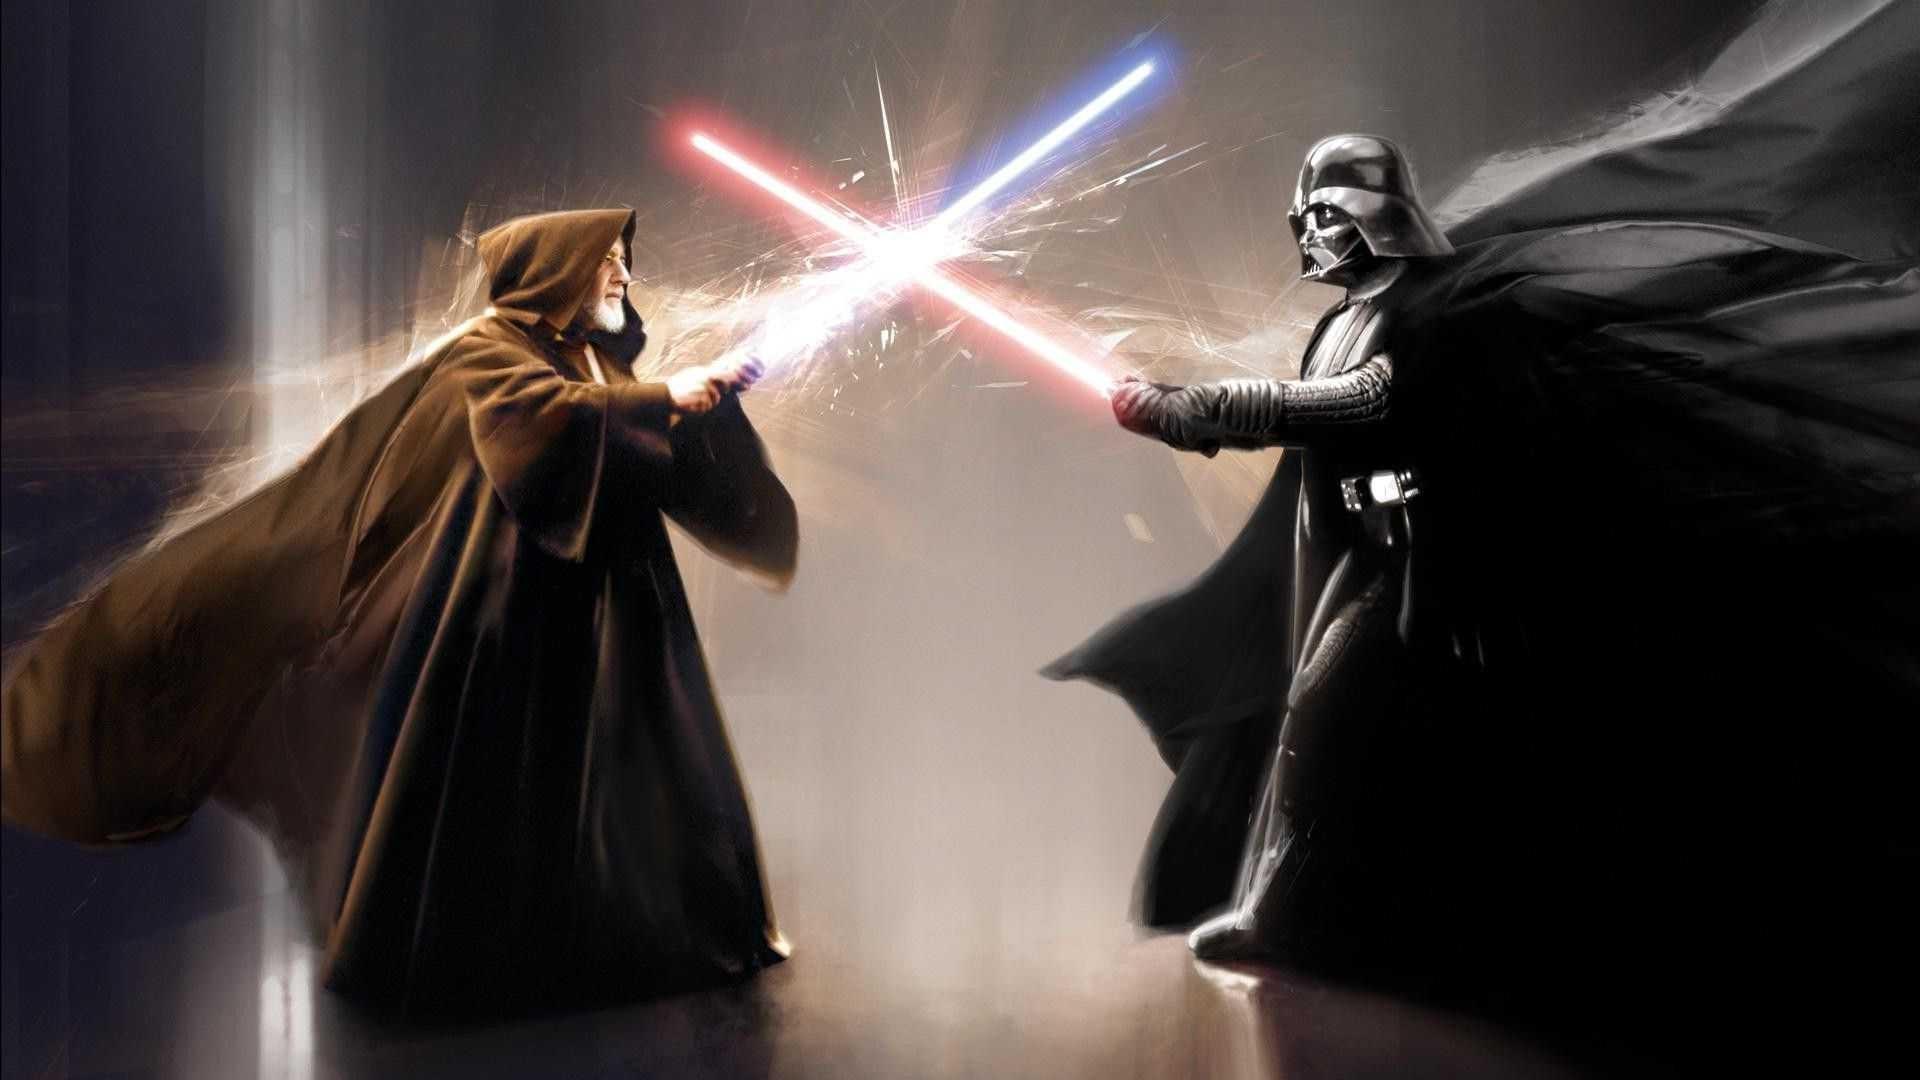 Star Wars Anakin Skywalker Wallpaper: Obi Wan Vs Anakin Wallpaper (70+ Images